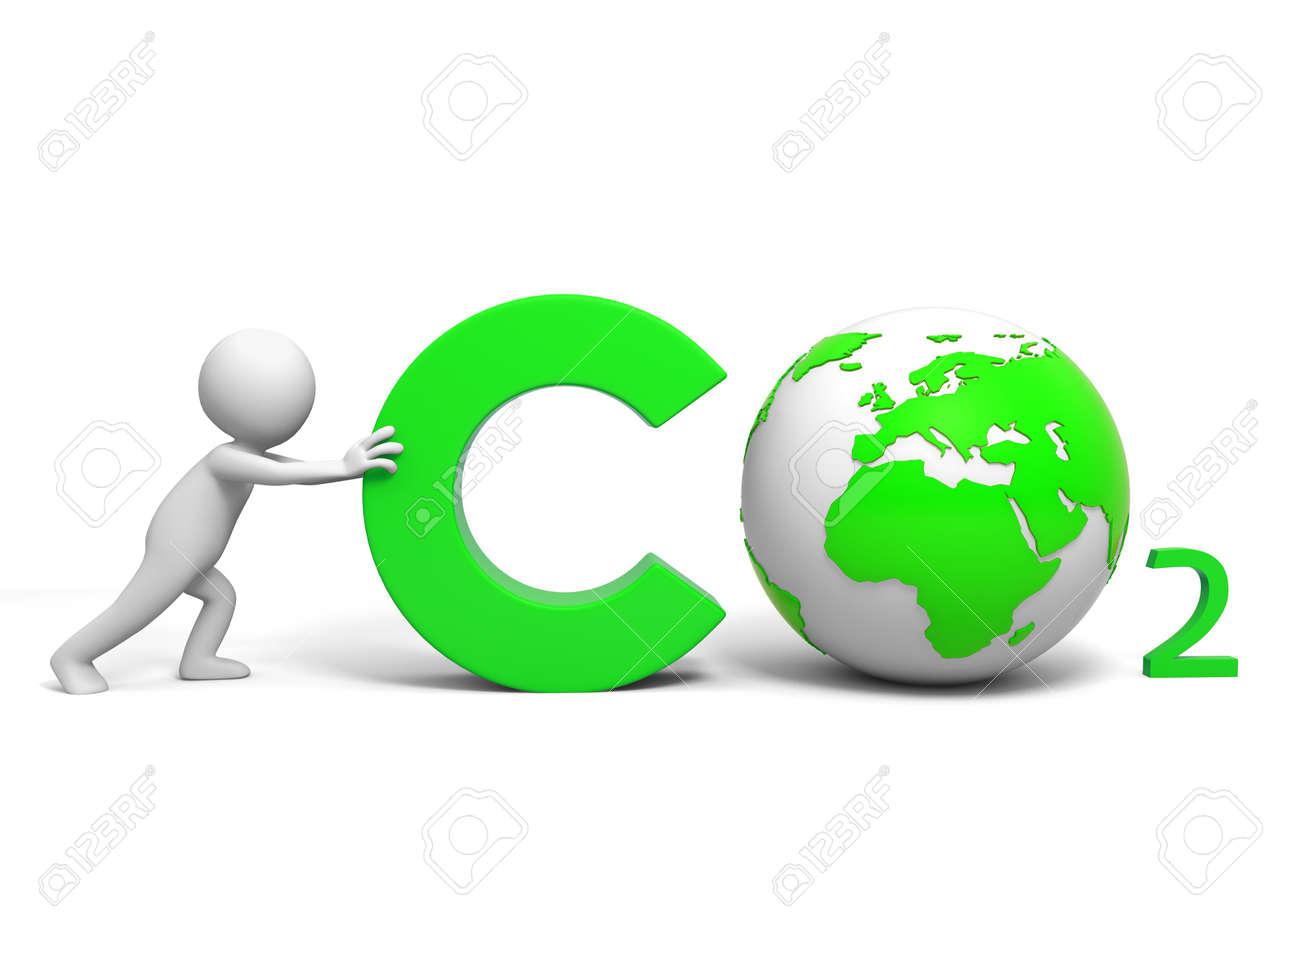 co2 記号を押すことで co2 環境保護 a の人々 ロイヤリティーフリー